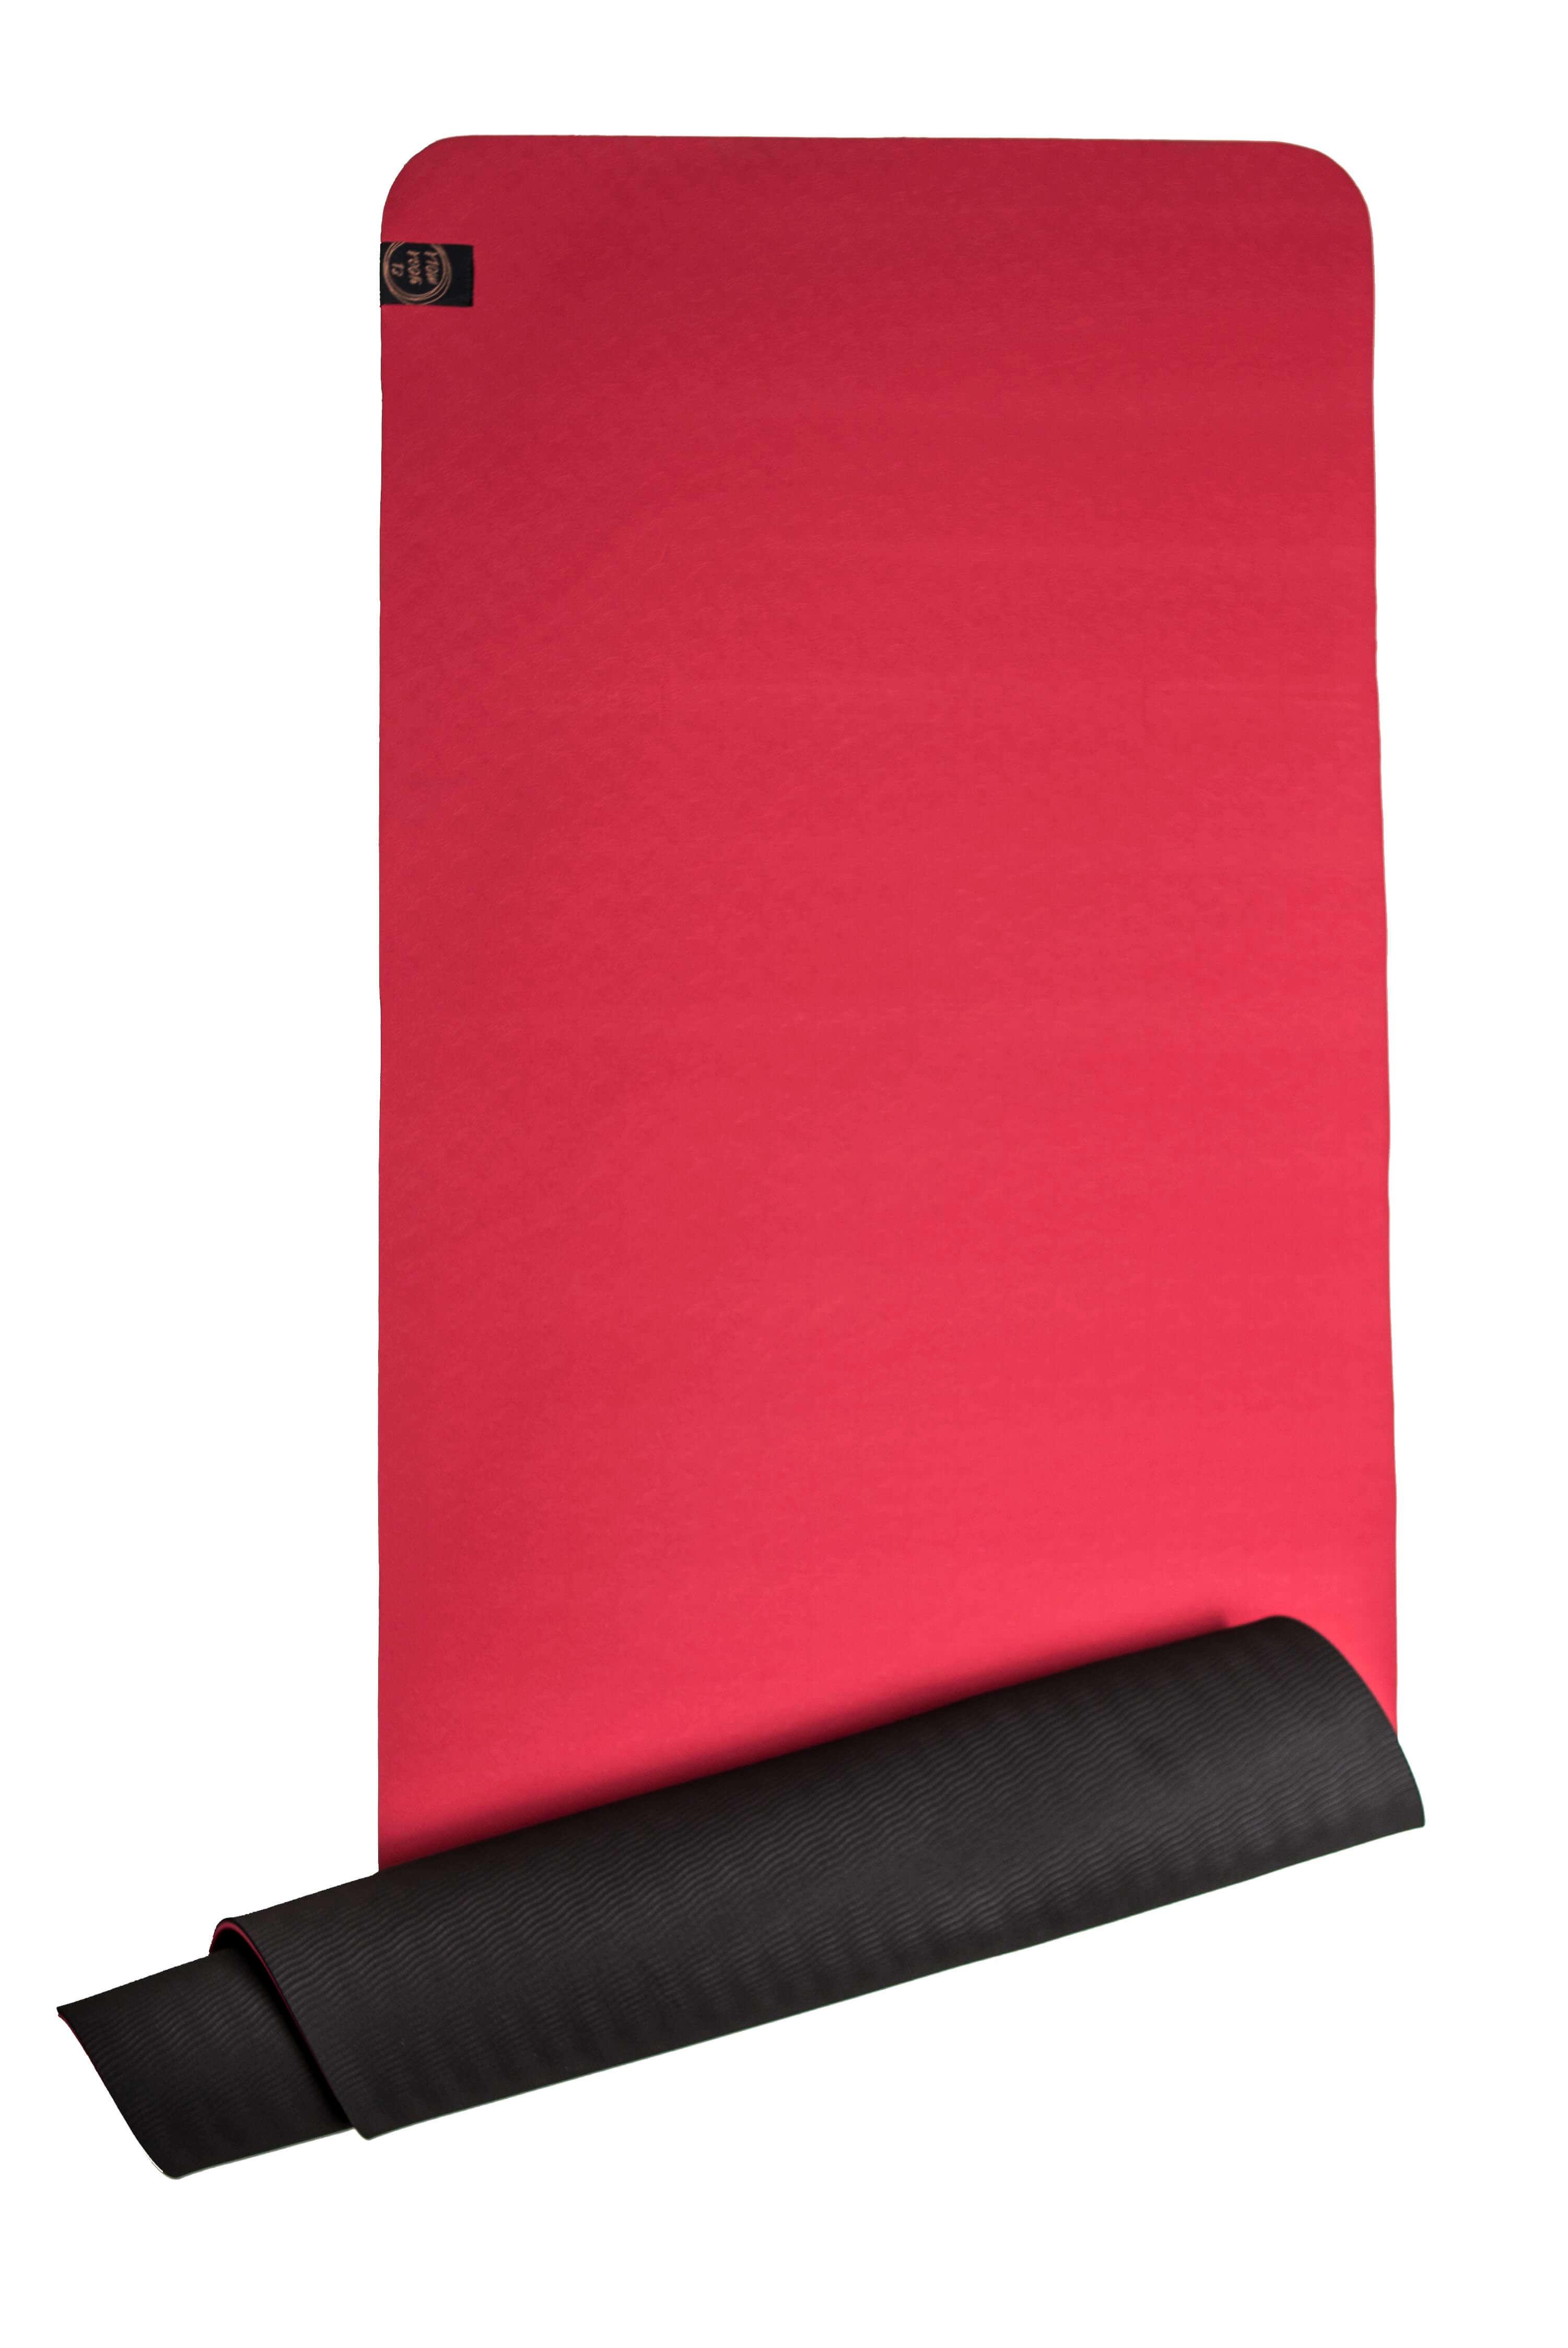 Esterilla Yoga Bicolor Grosor 6mm